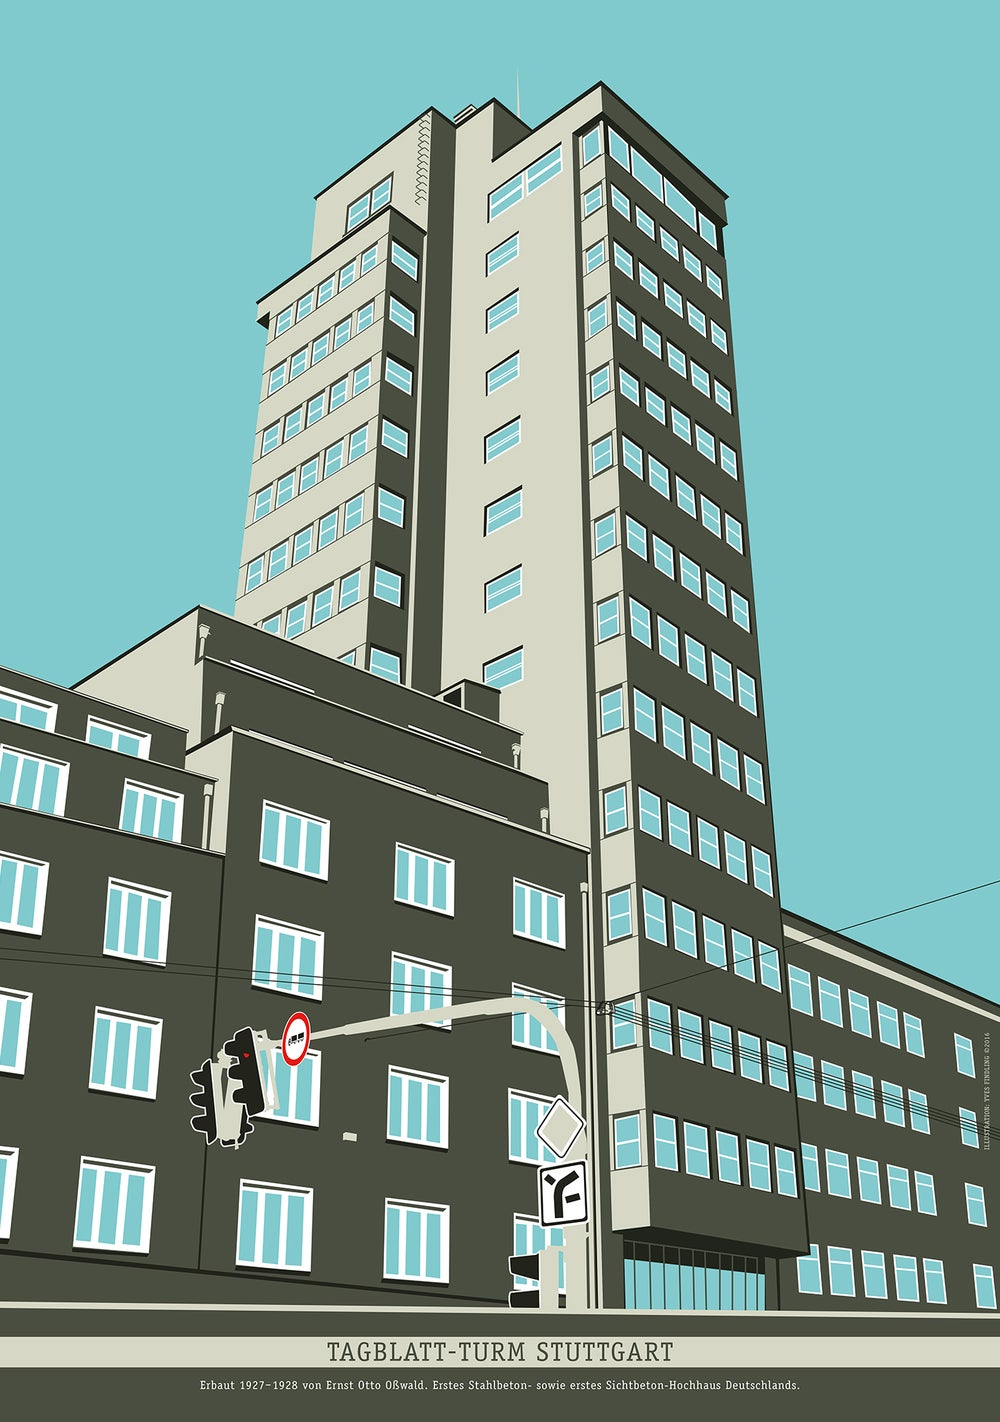 Image of Poster Tagblatt-Turm